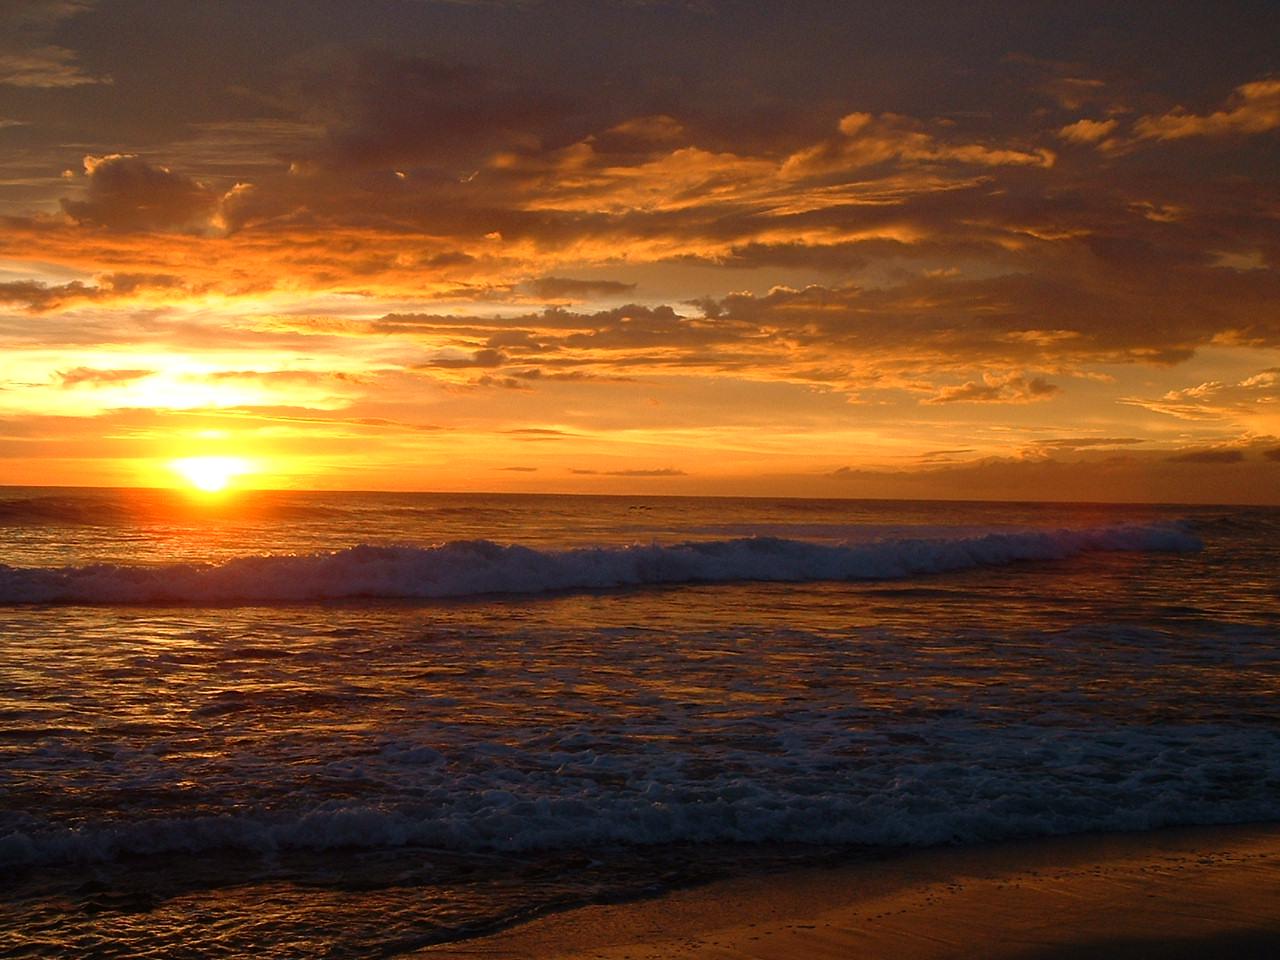 Sunset On The Beach - Wallpaper #35662